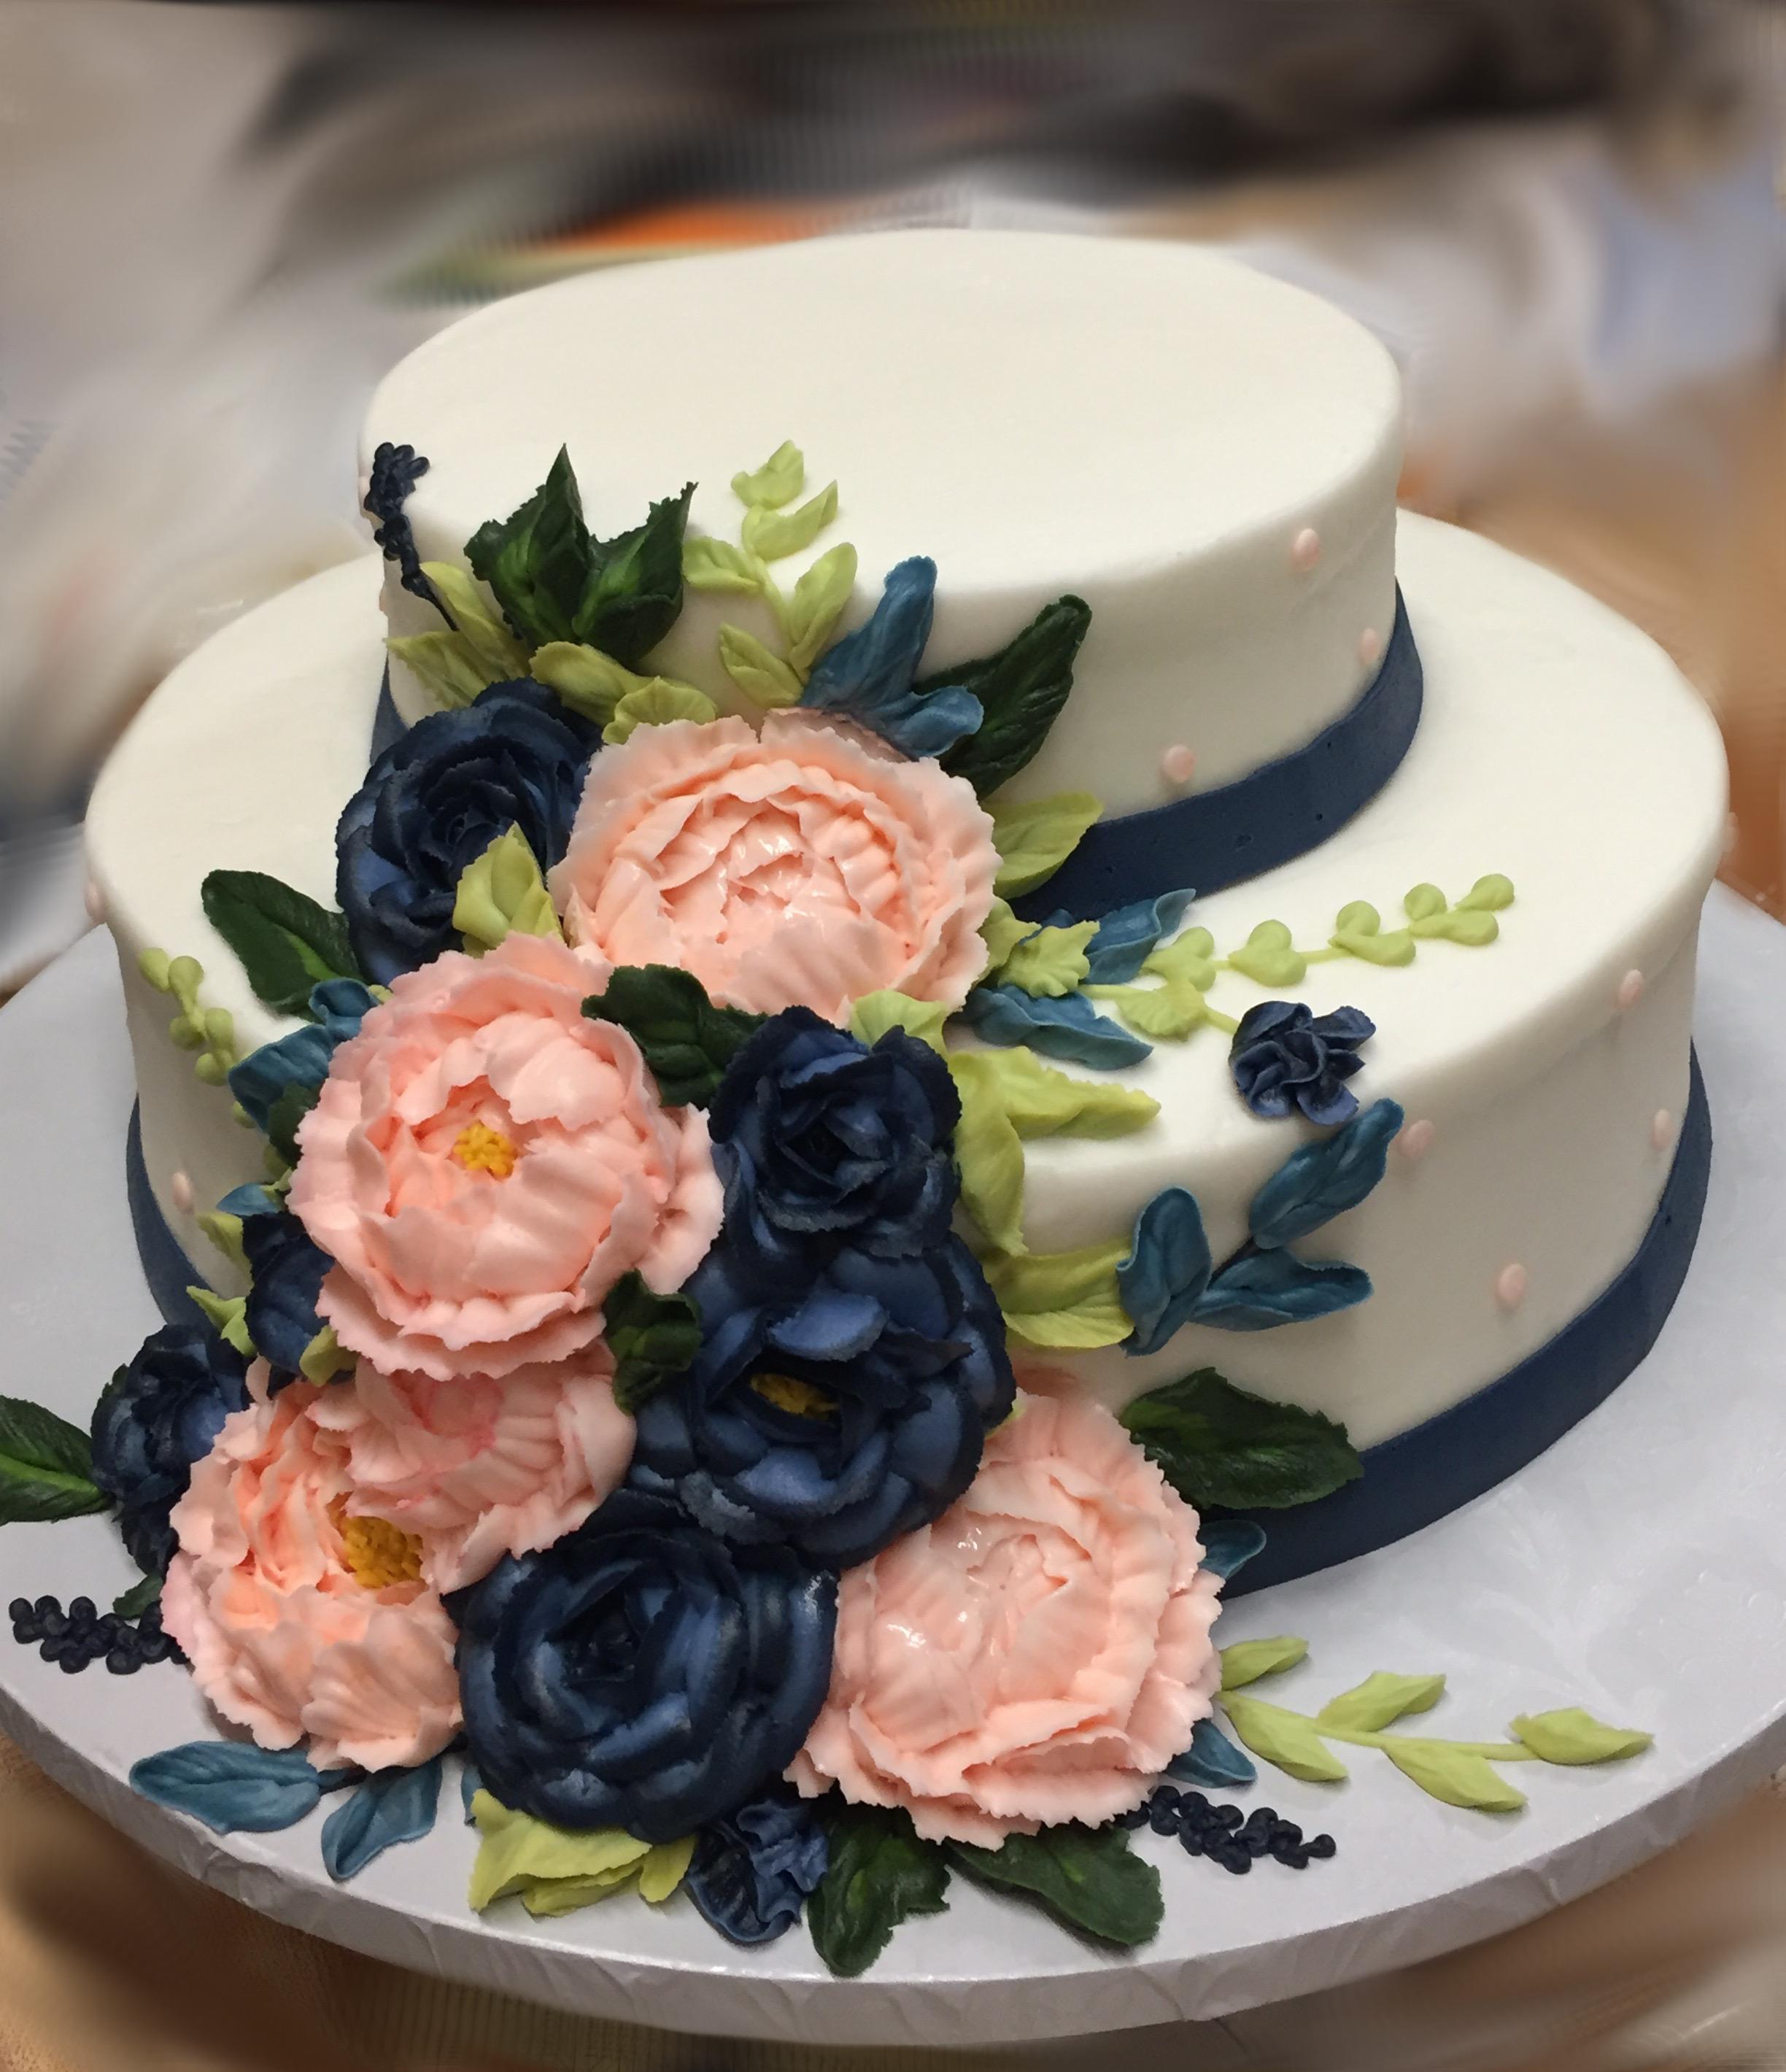 Peachy Cakes For Any Occasion Bakery Westhampton Pastry Richmond Va Funny Birthday Cards Online Bapapcheapnameinfo